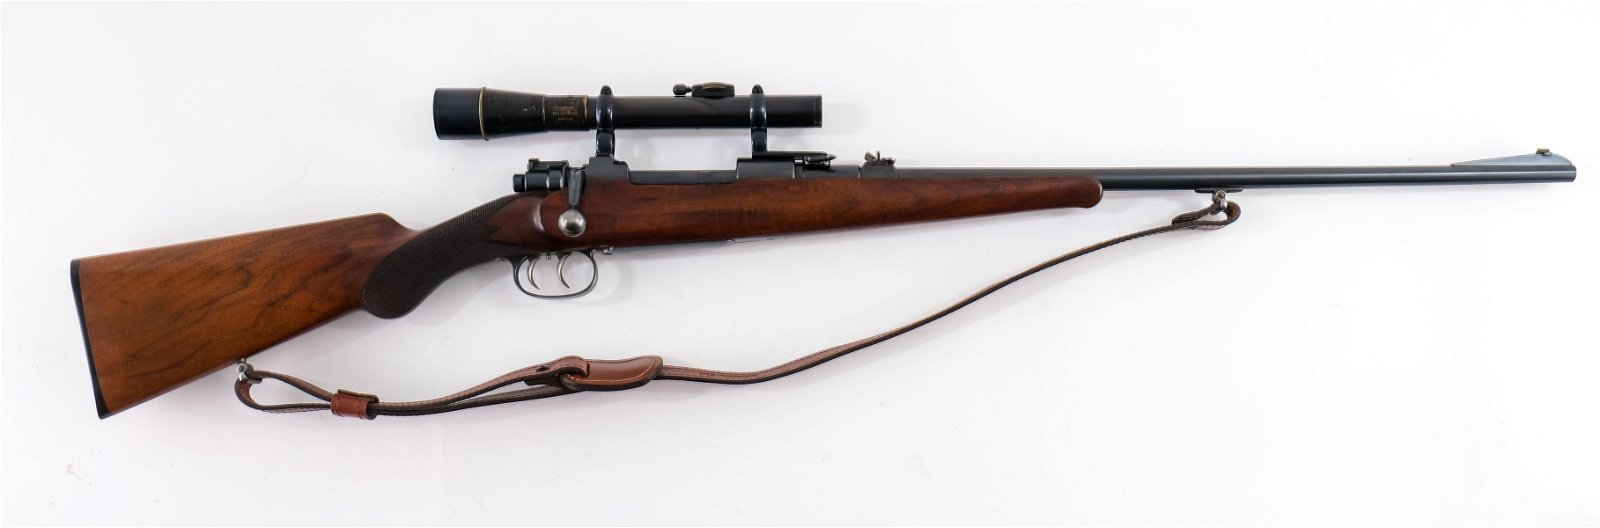 German Mauser Type B 8mm Rifle